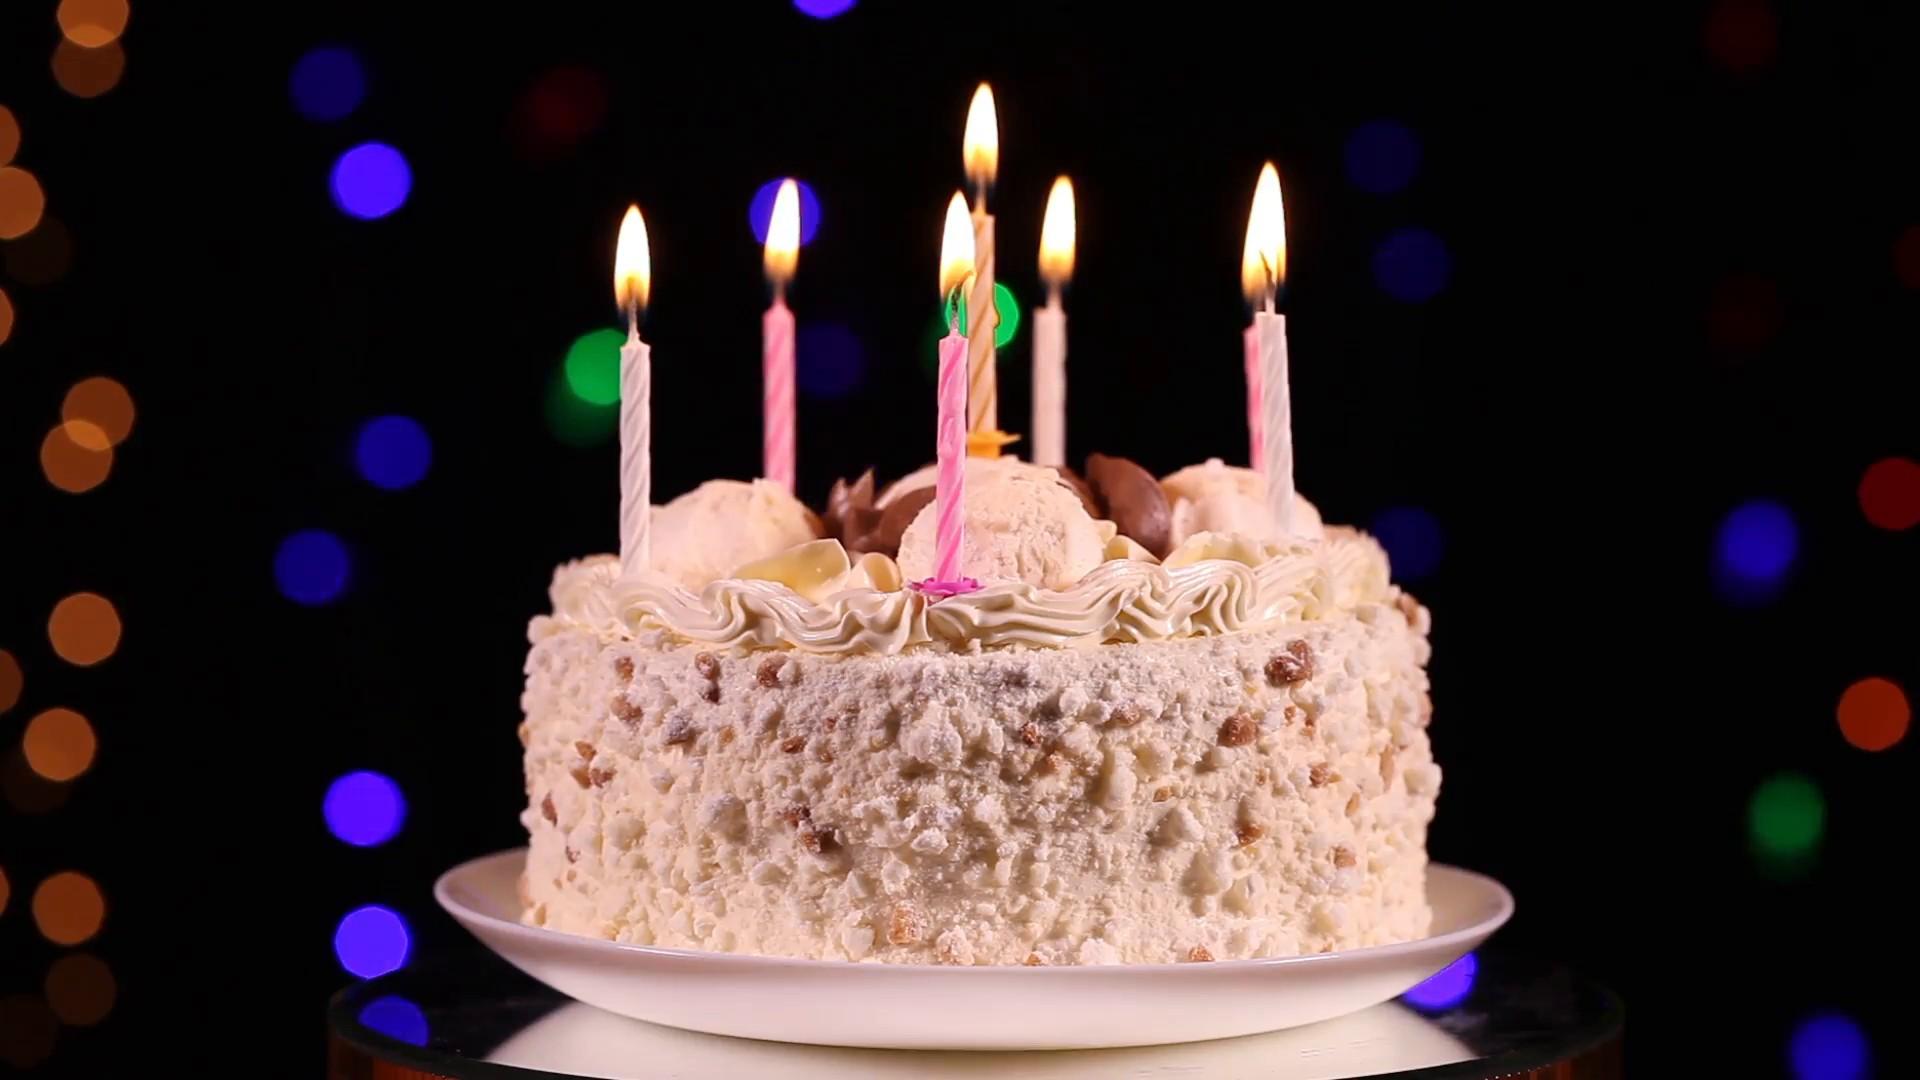 Birthday Cake free background